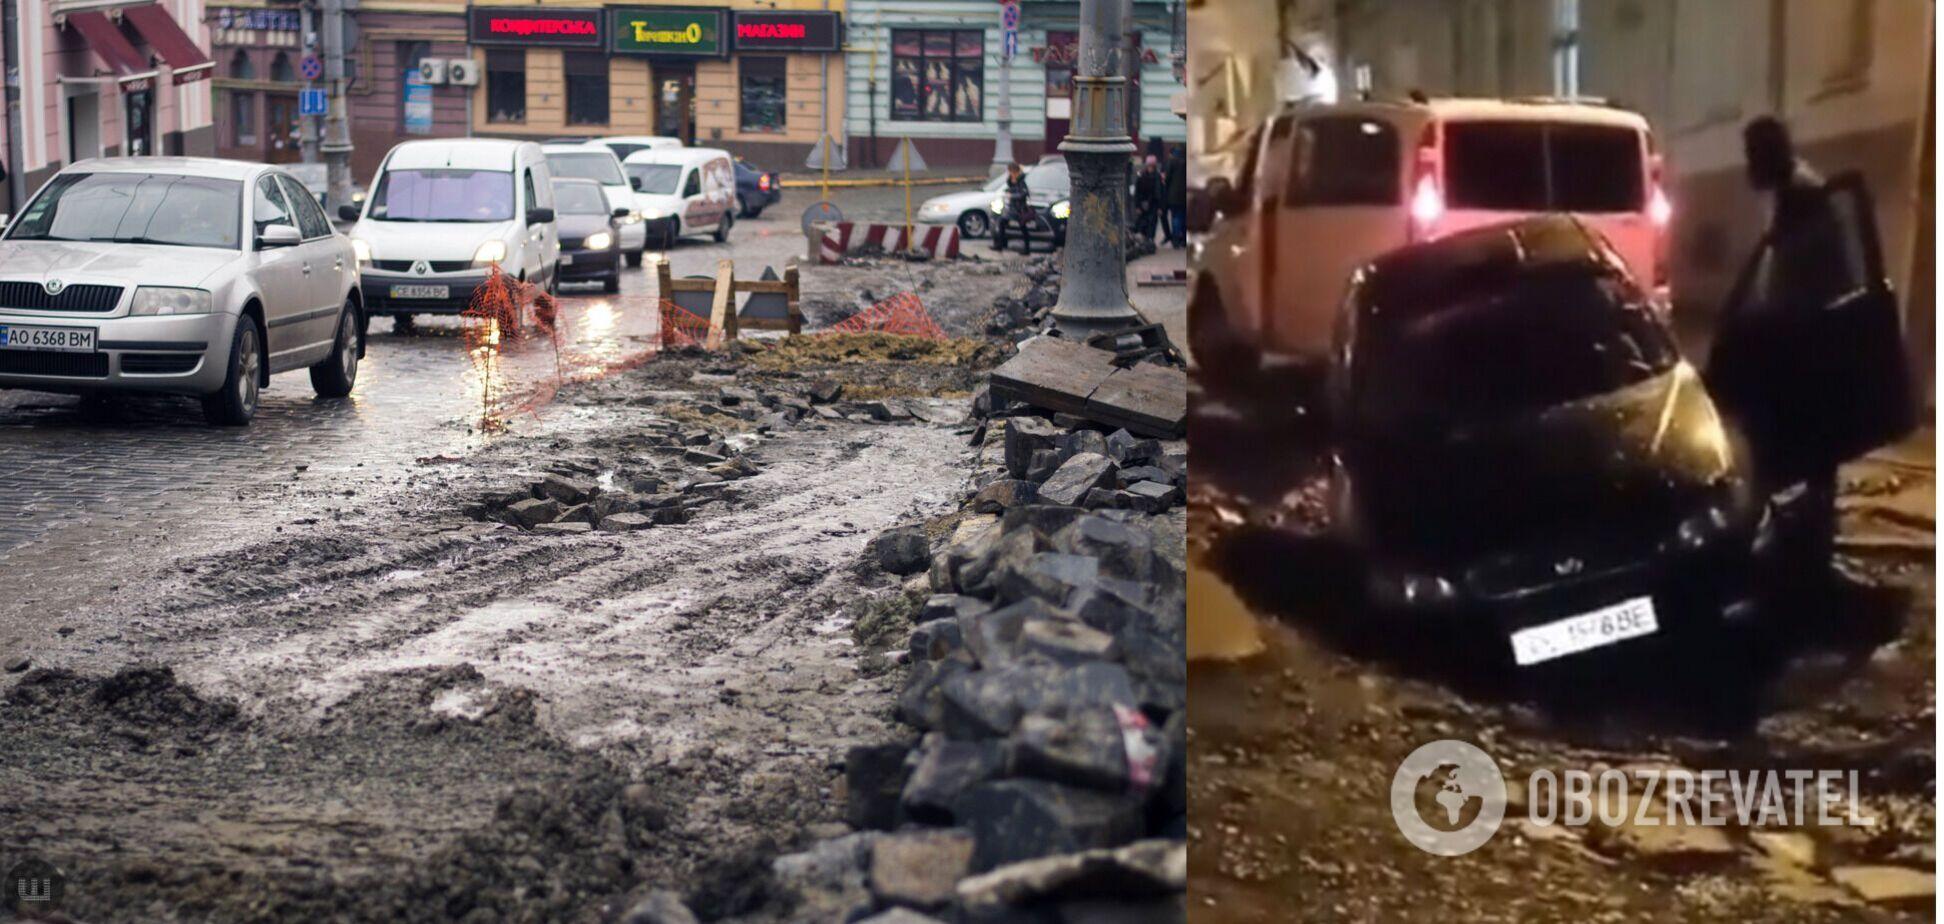 В Черновцах авто провалилось в огромную яму посреди дороги. Видео